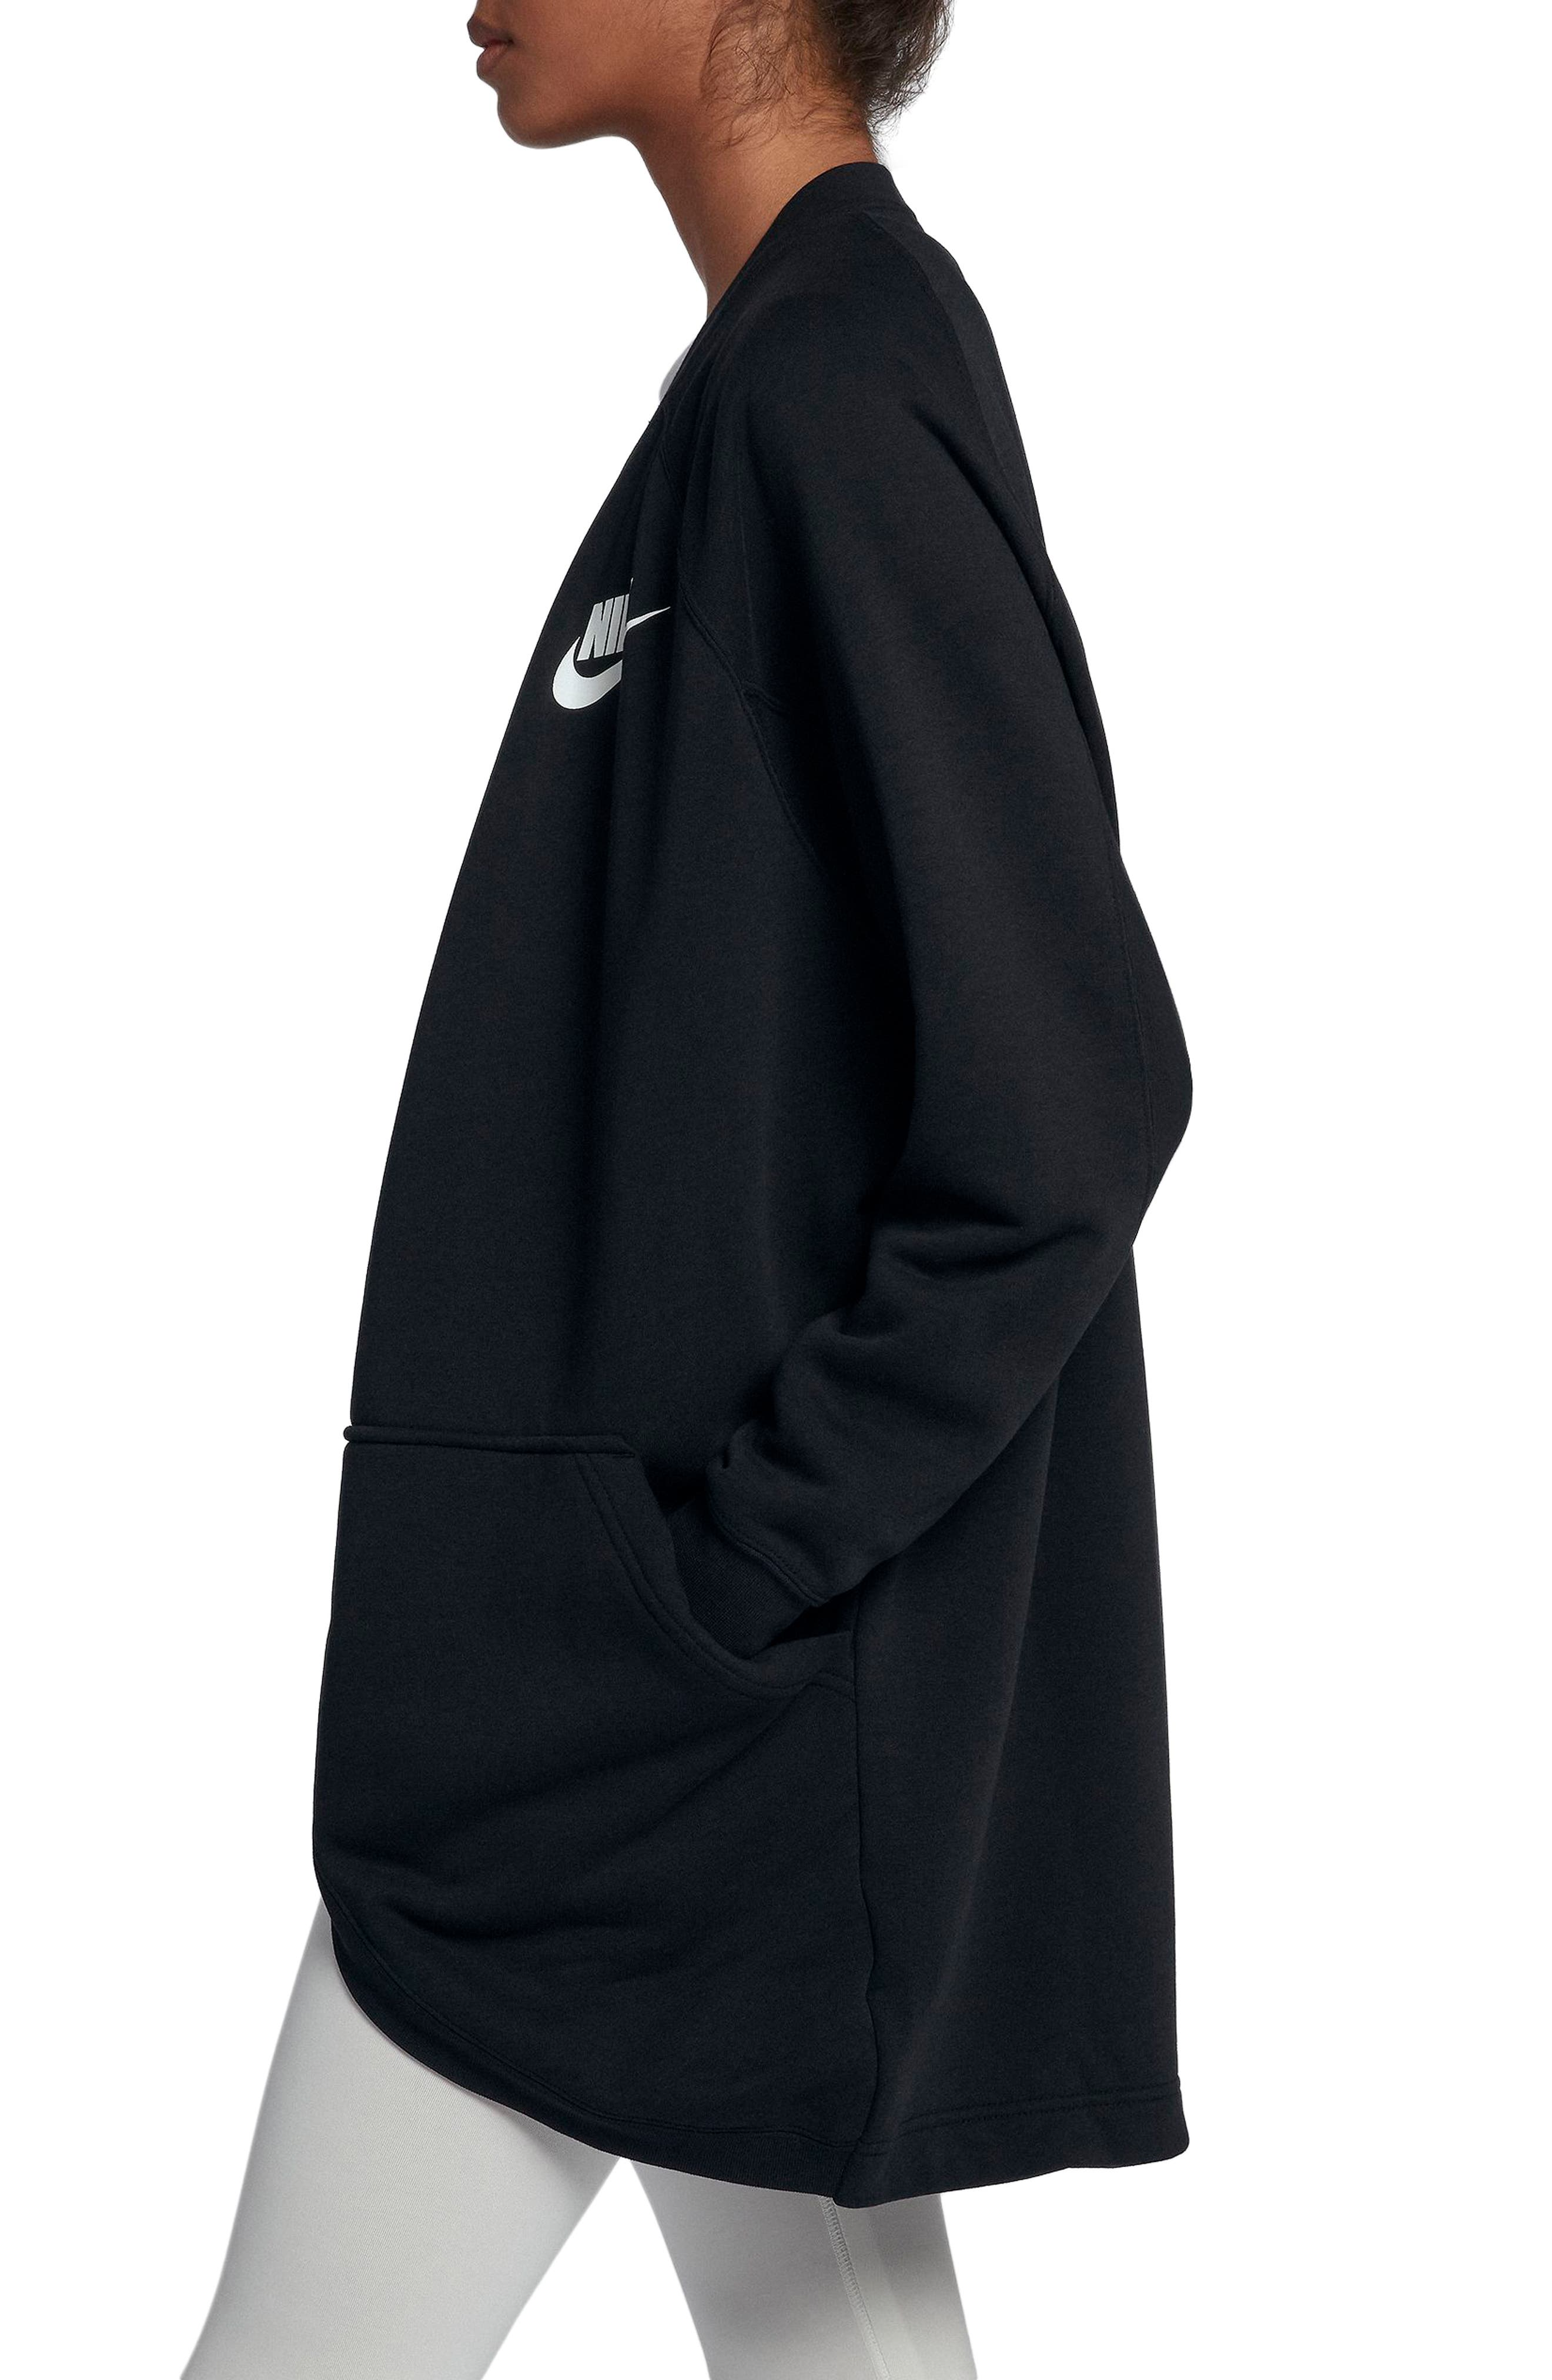 Sportswear Rally Cardigan,                             Alternate thumbnail 3, color,                             BLACK/ BLACK/ WHITE